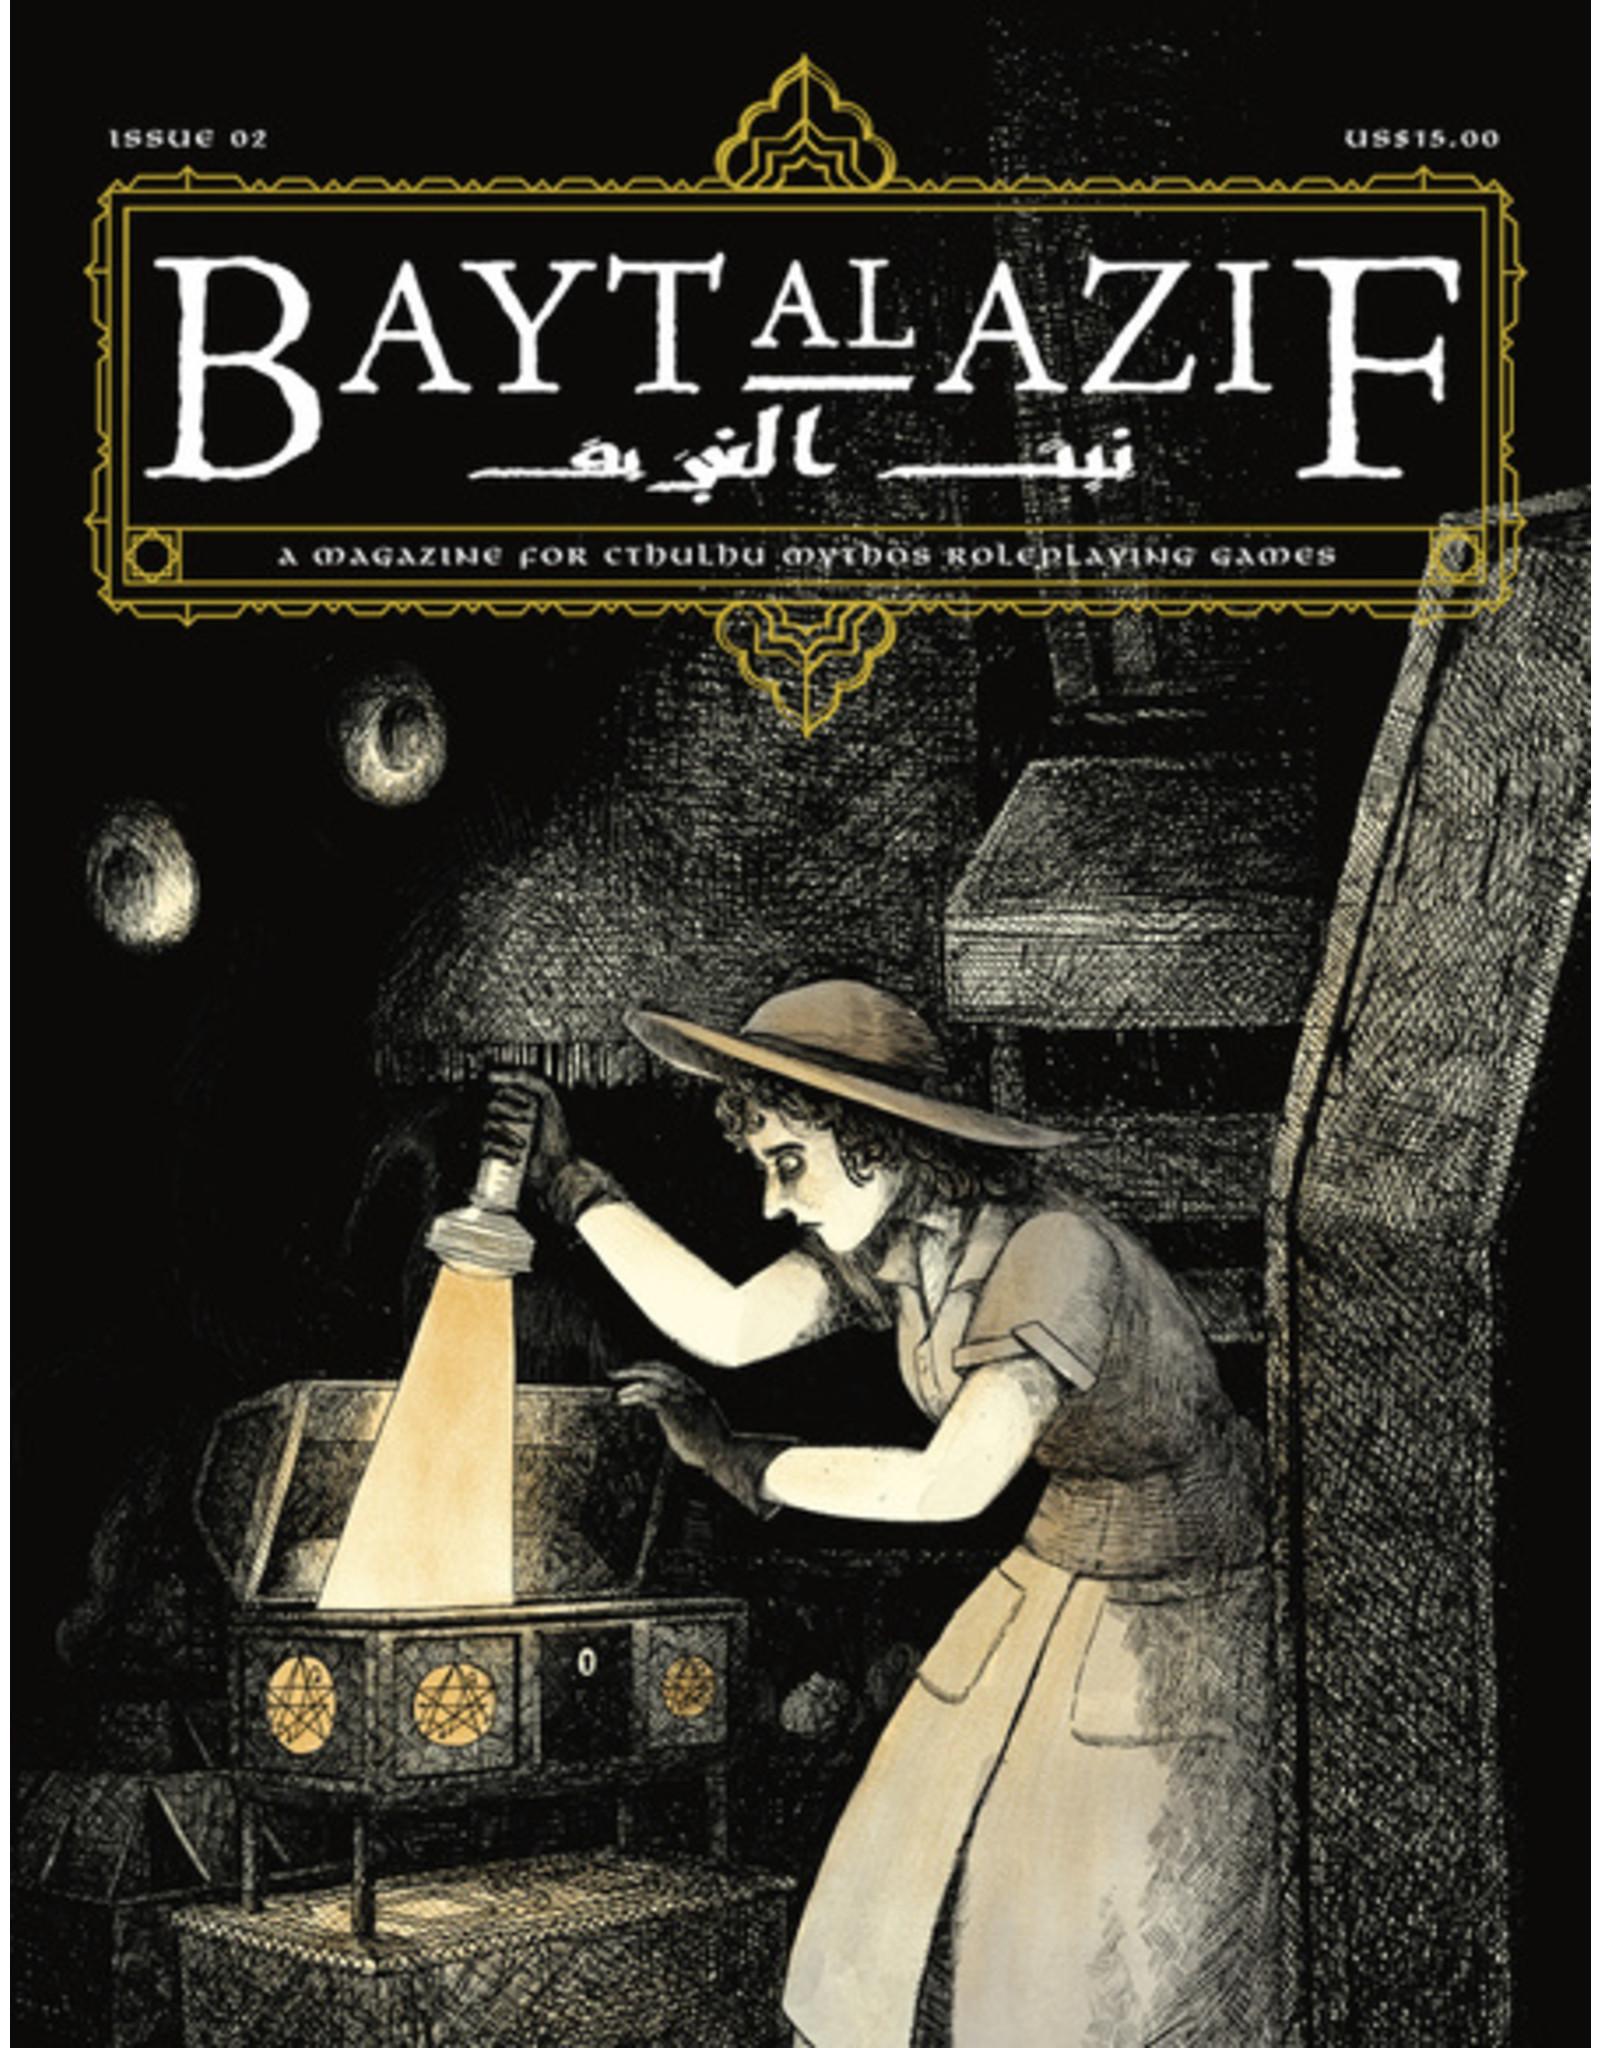 Bayt al Azif #2: A Magazine for Cthulhu Mythos RPGs